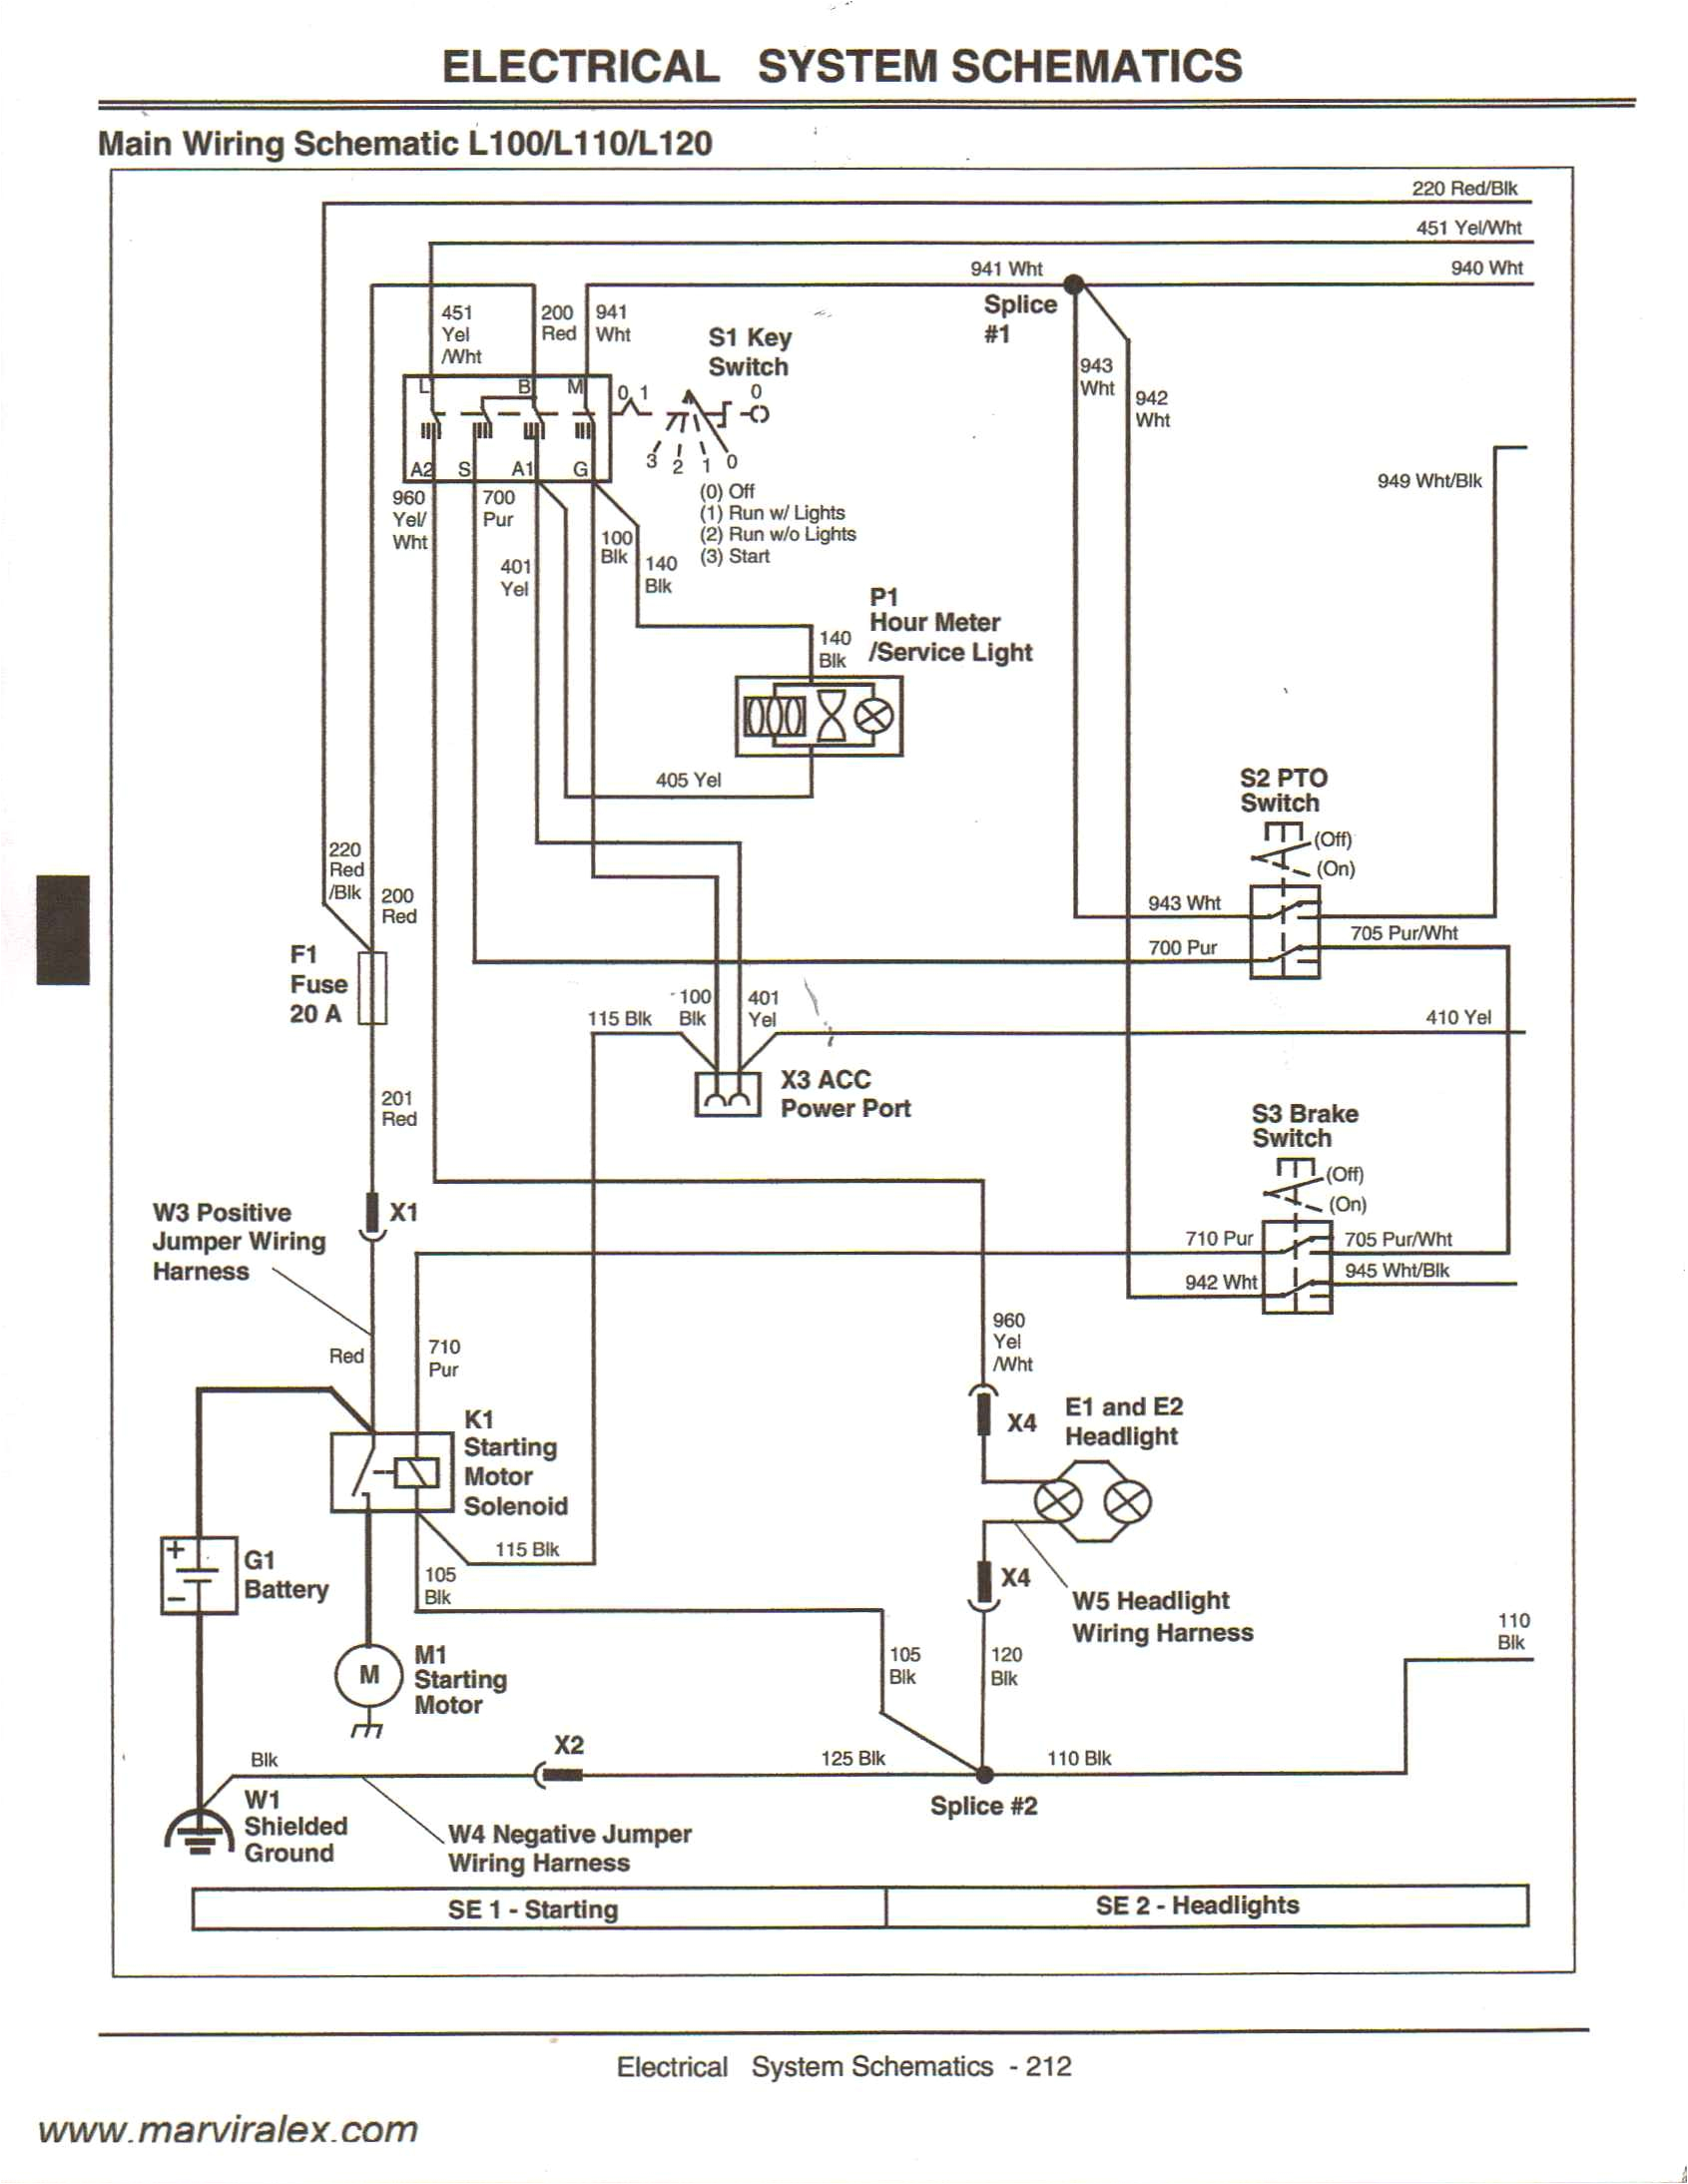 John Deere 111 Lawn Tractor Wiring Diagram Wiring Diagram John Deere Wiring Diagram